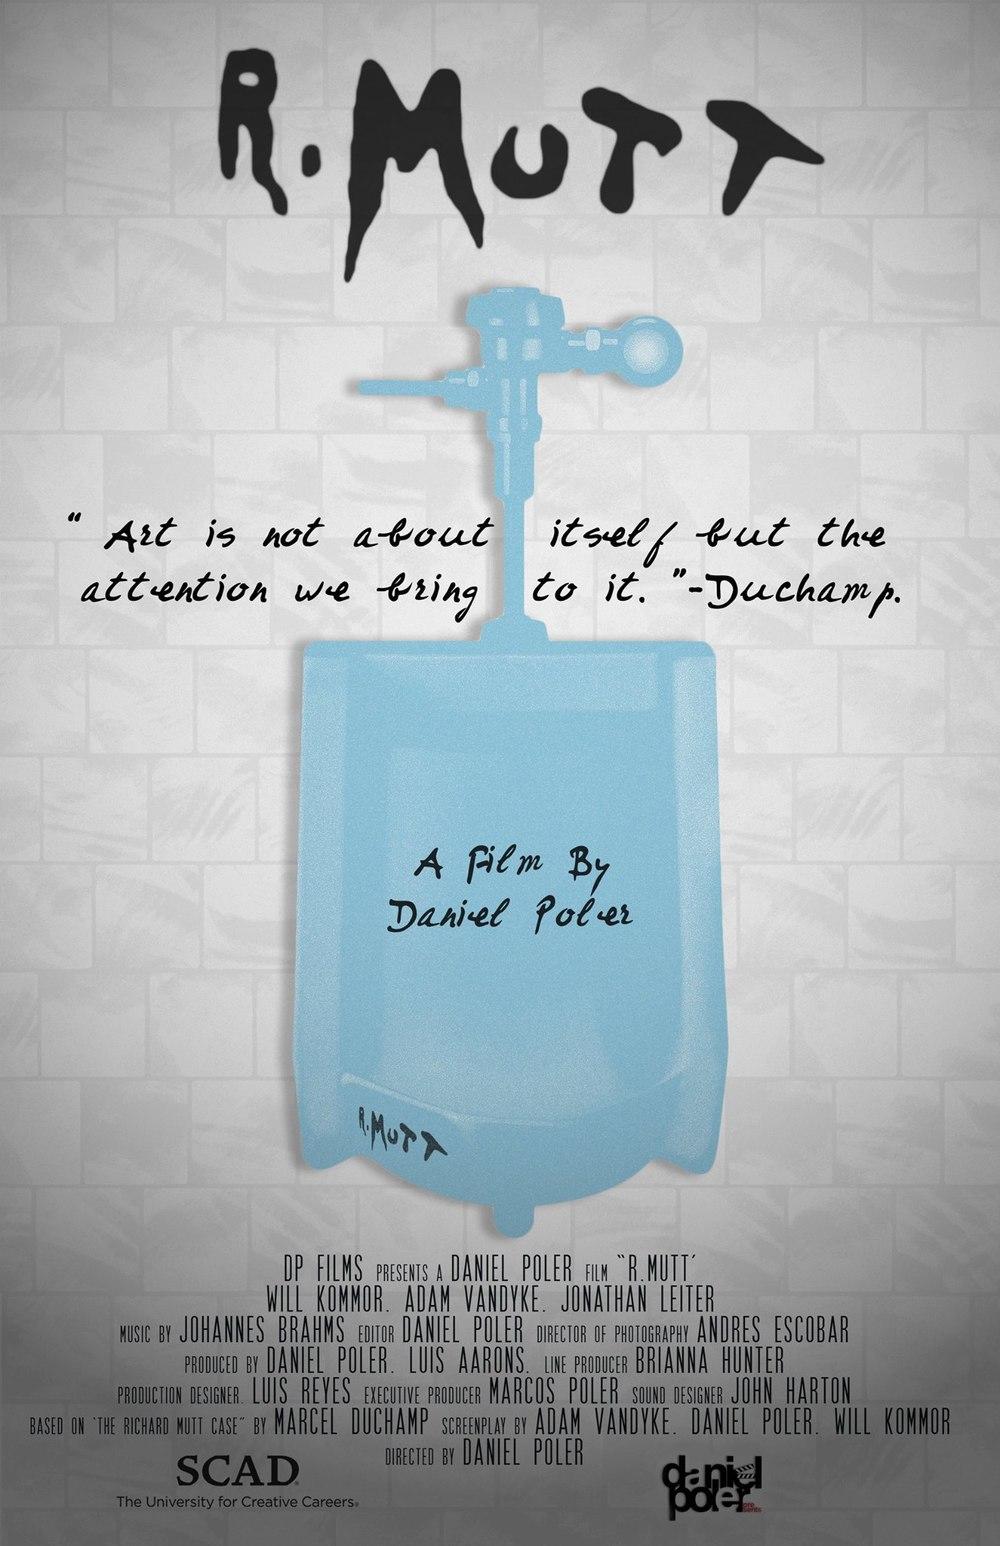 R.Mutt poster design by Daniel Poler.